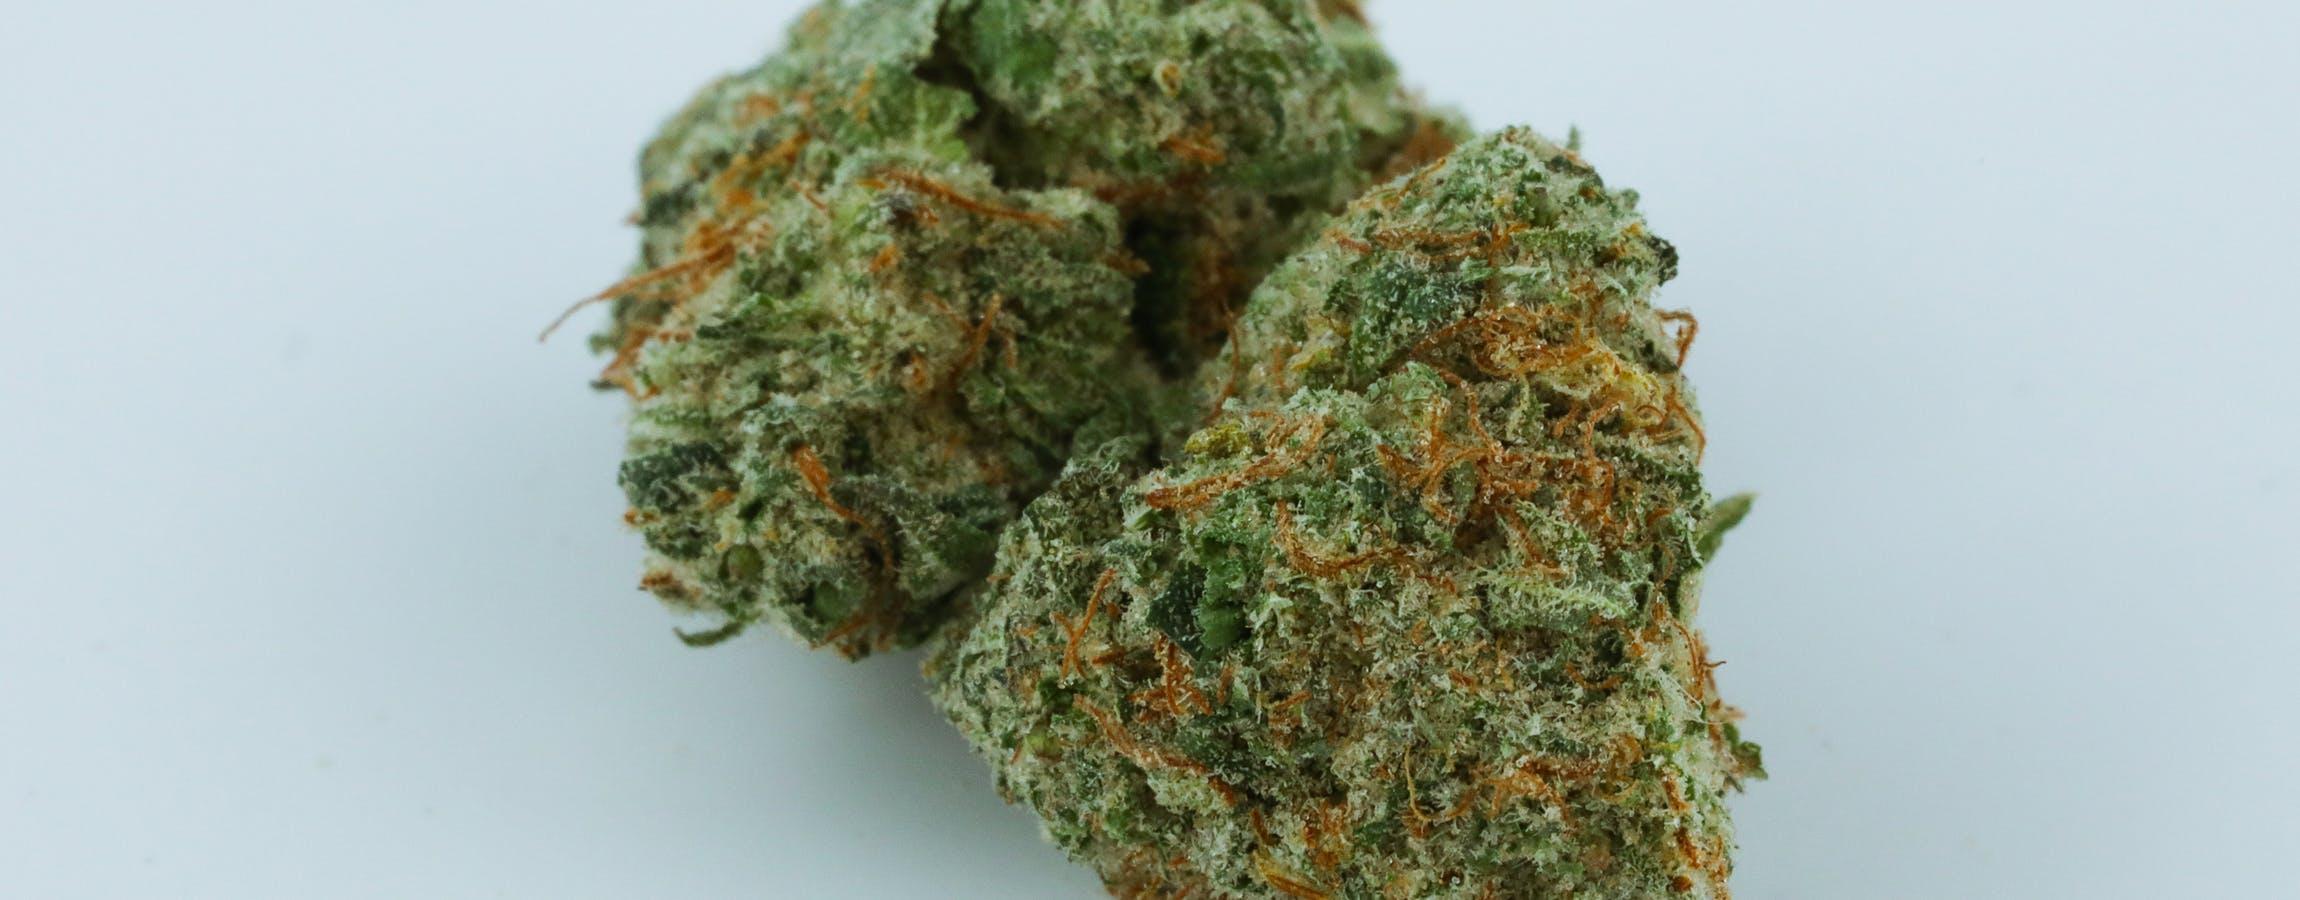 G13 Cannabis Strain ; G13 Weed Strain ; G13 Marijuana Strain ; G13 Indica Hybrid